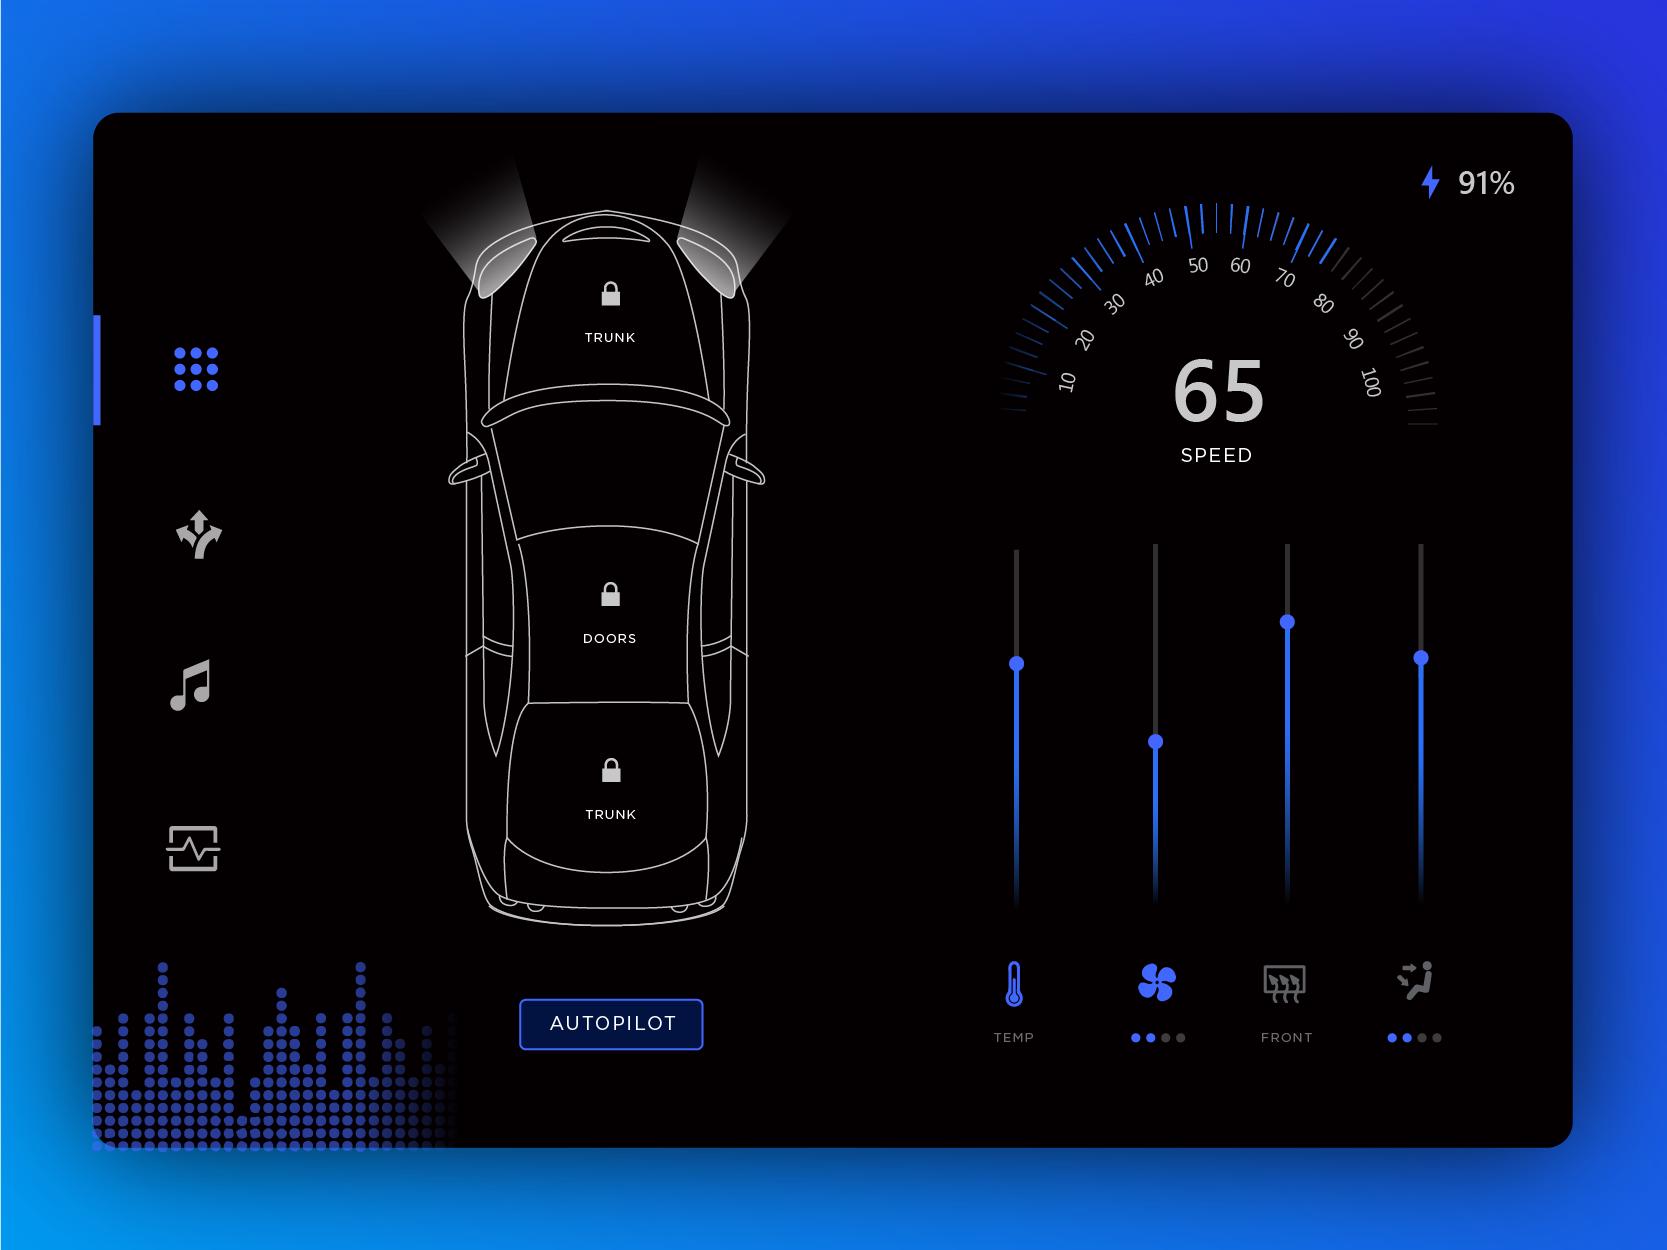 034: Car Interface